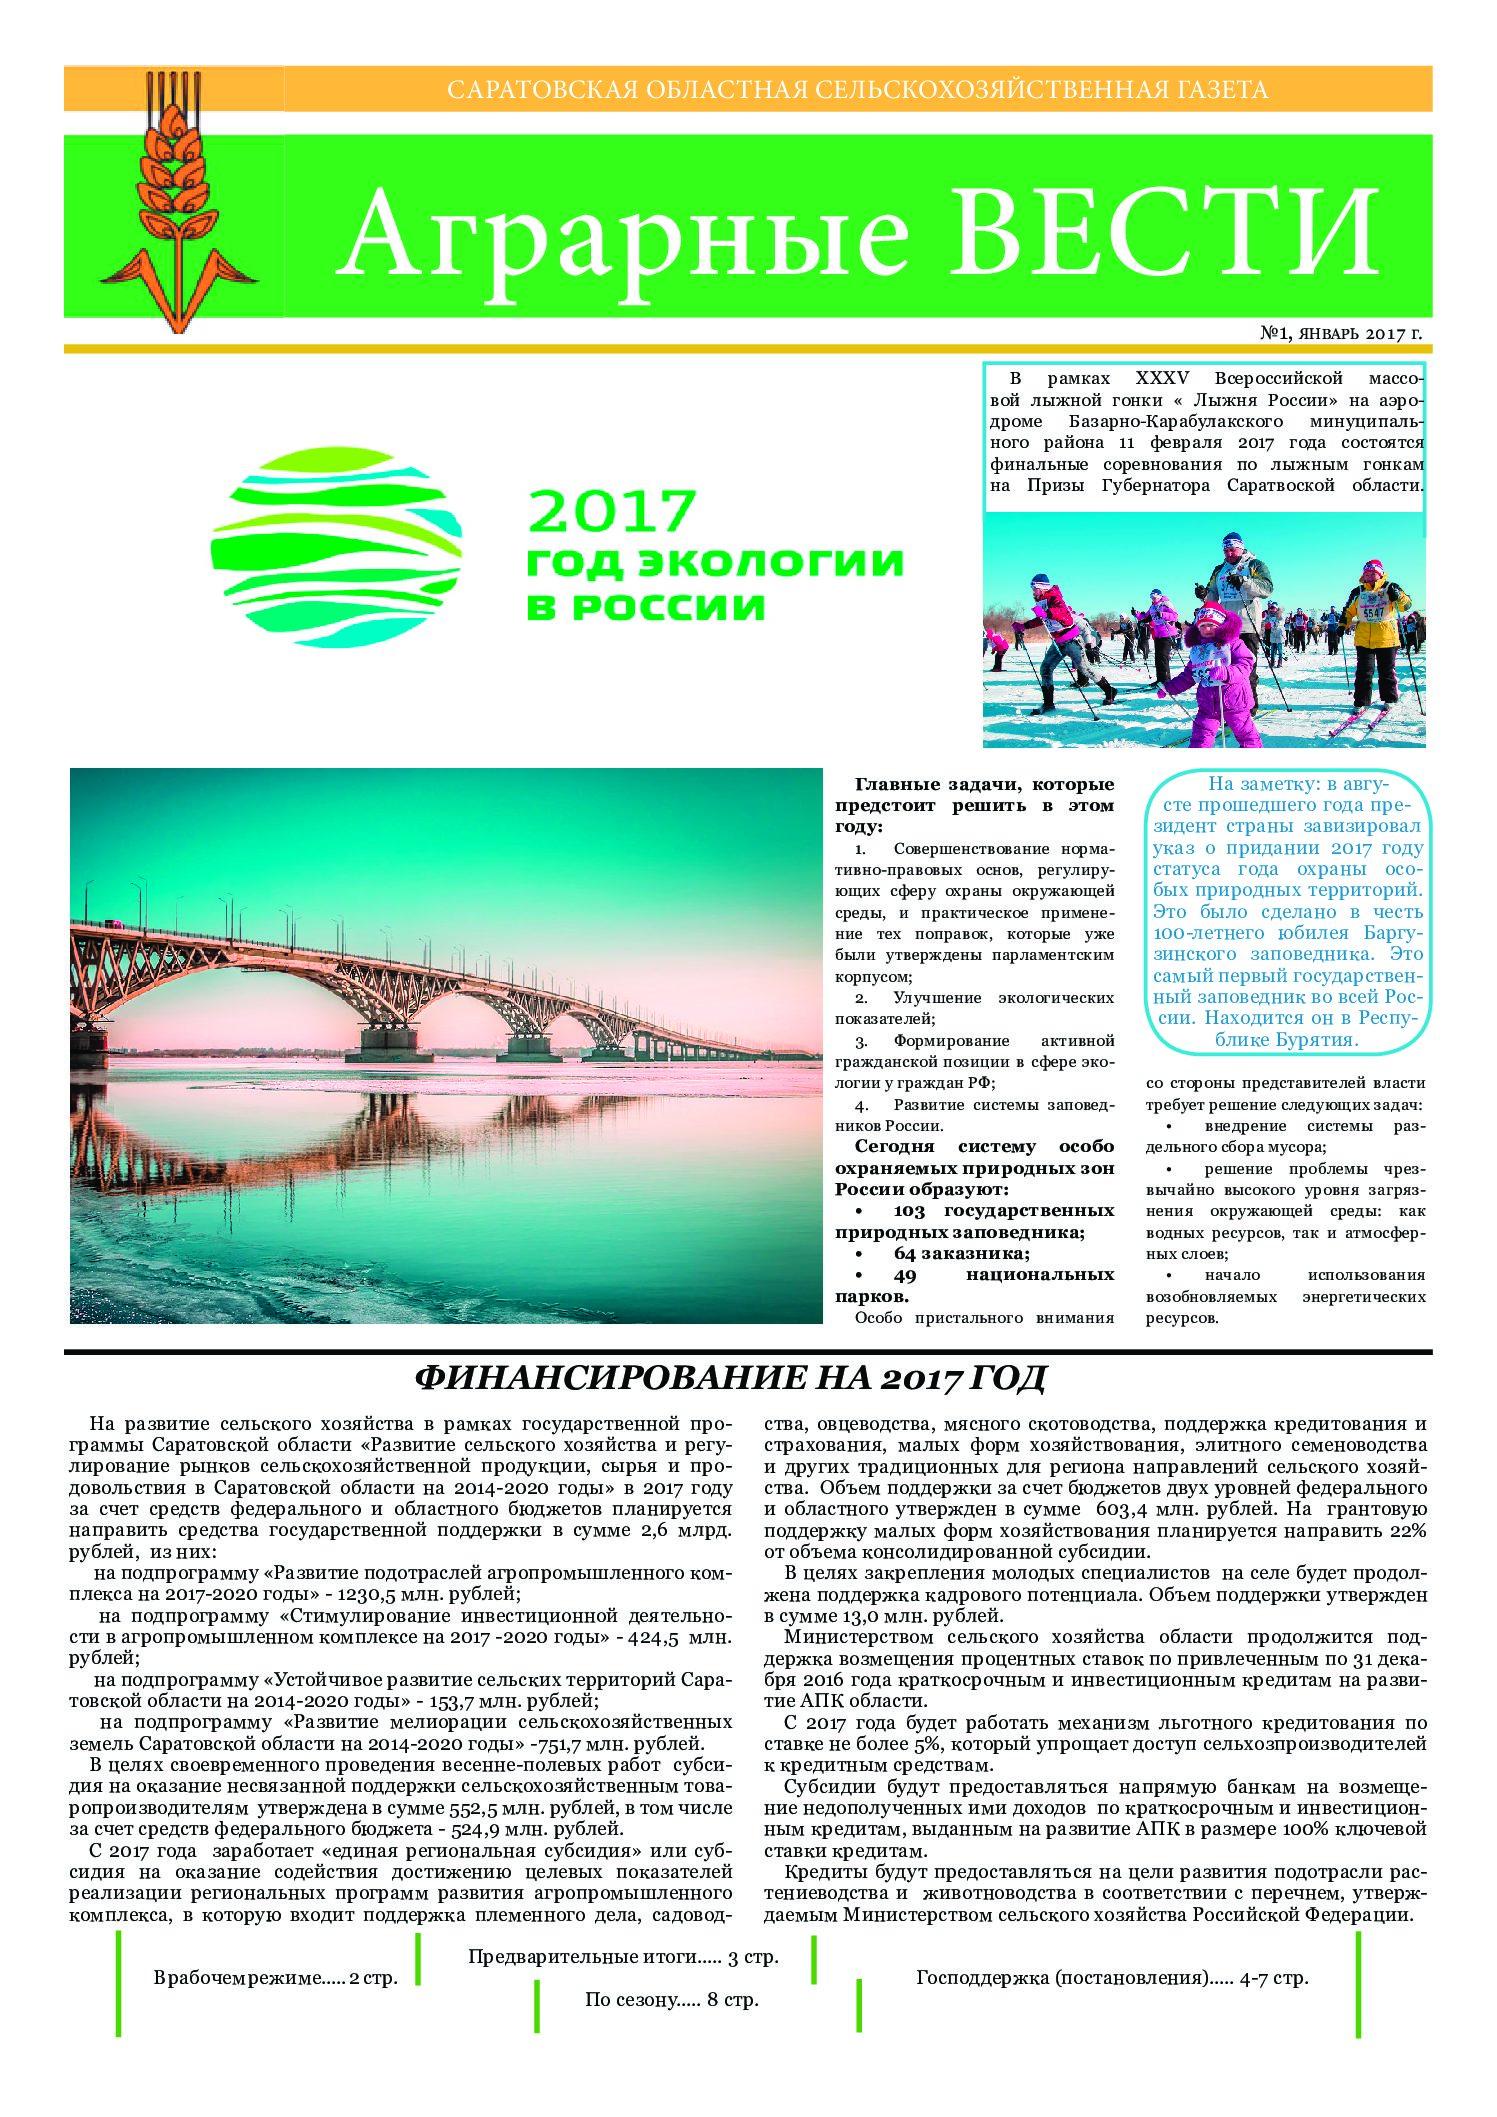 https://saratovagro.ru/wp-content/uploads/2020/08/январь-12-pdf.jpg